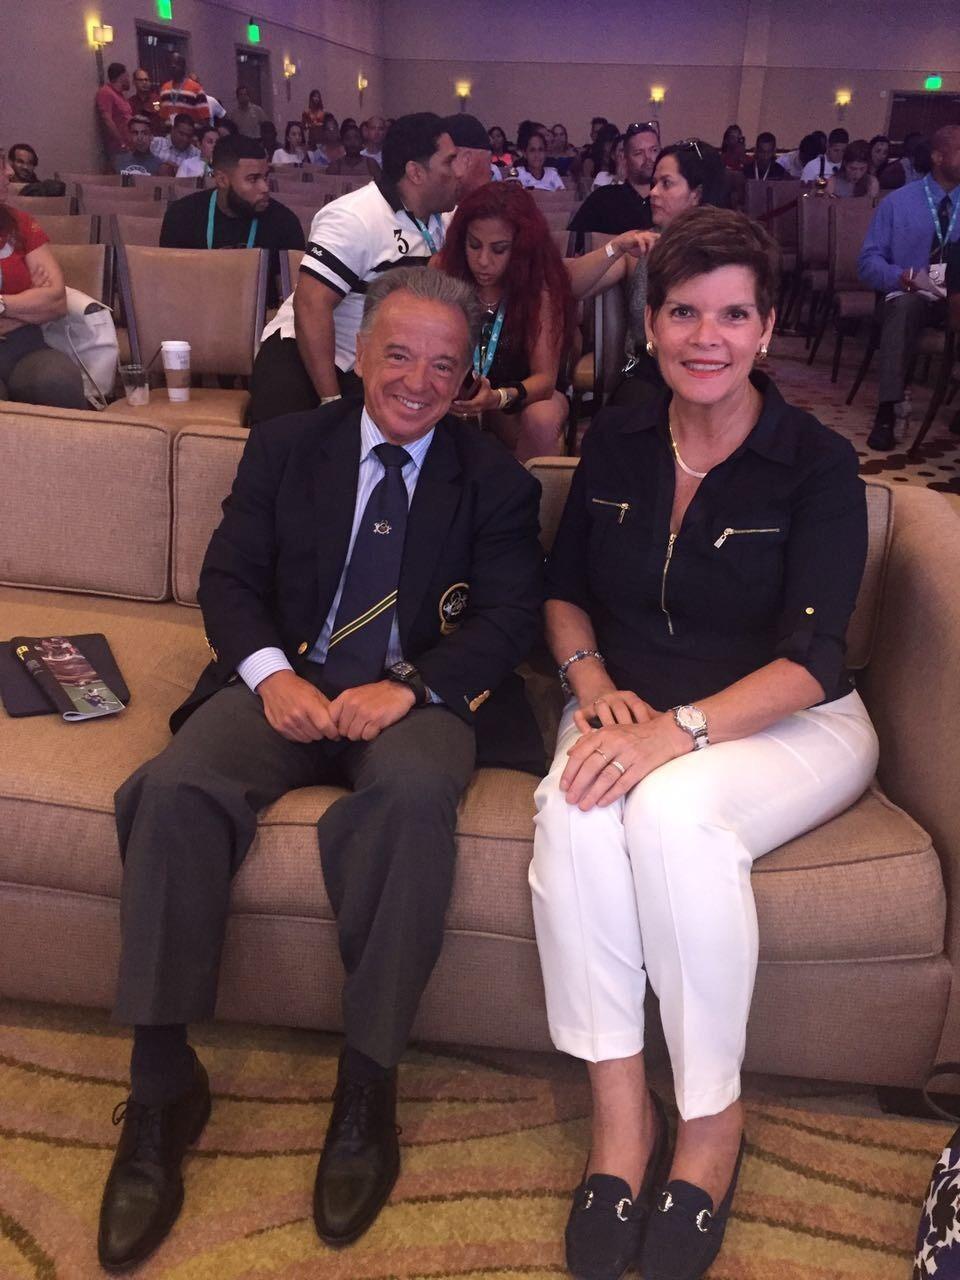 IFBB President Dr. Rafael Santonja met with IOC member Nicole Hoevertsz ©IFBB